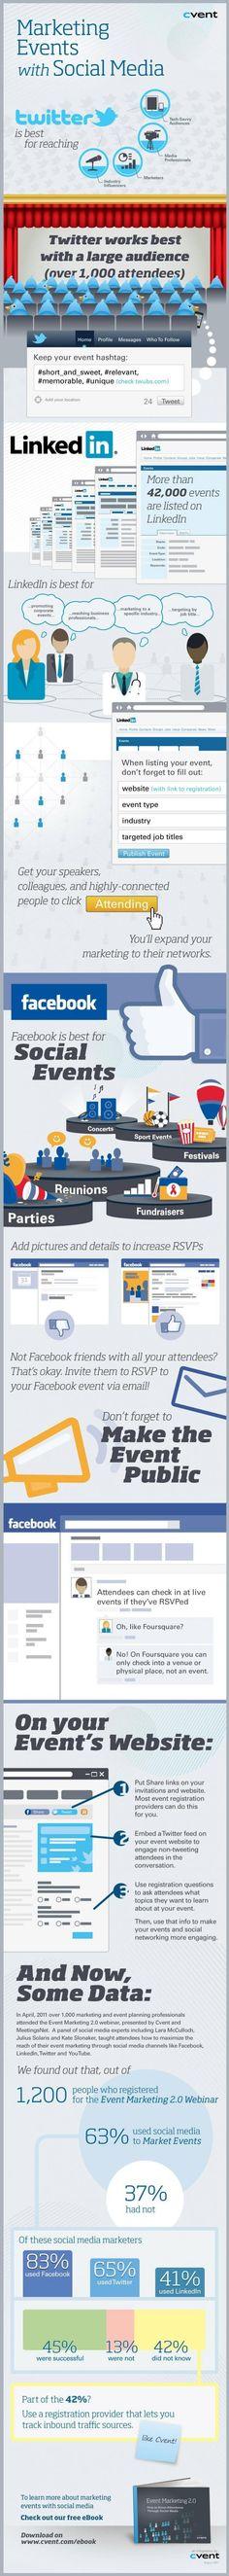 #Marketing #Events with #SocialMedia